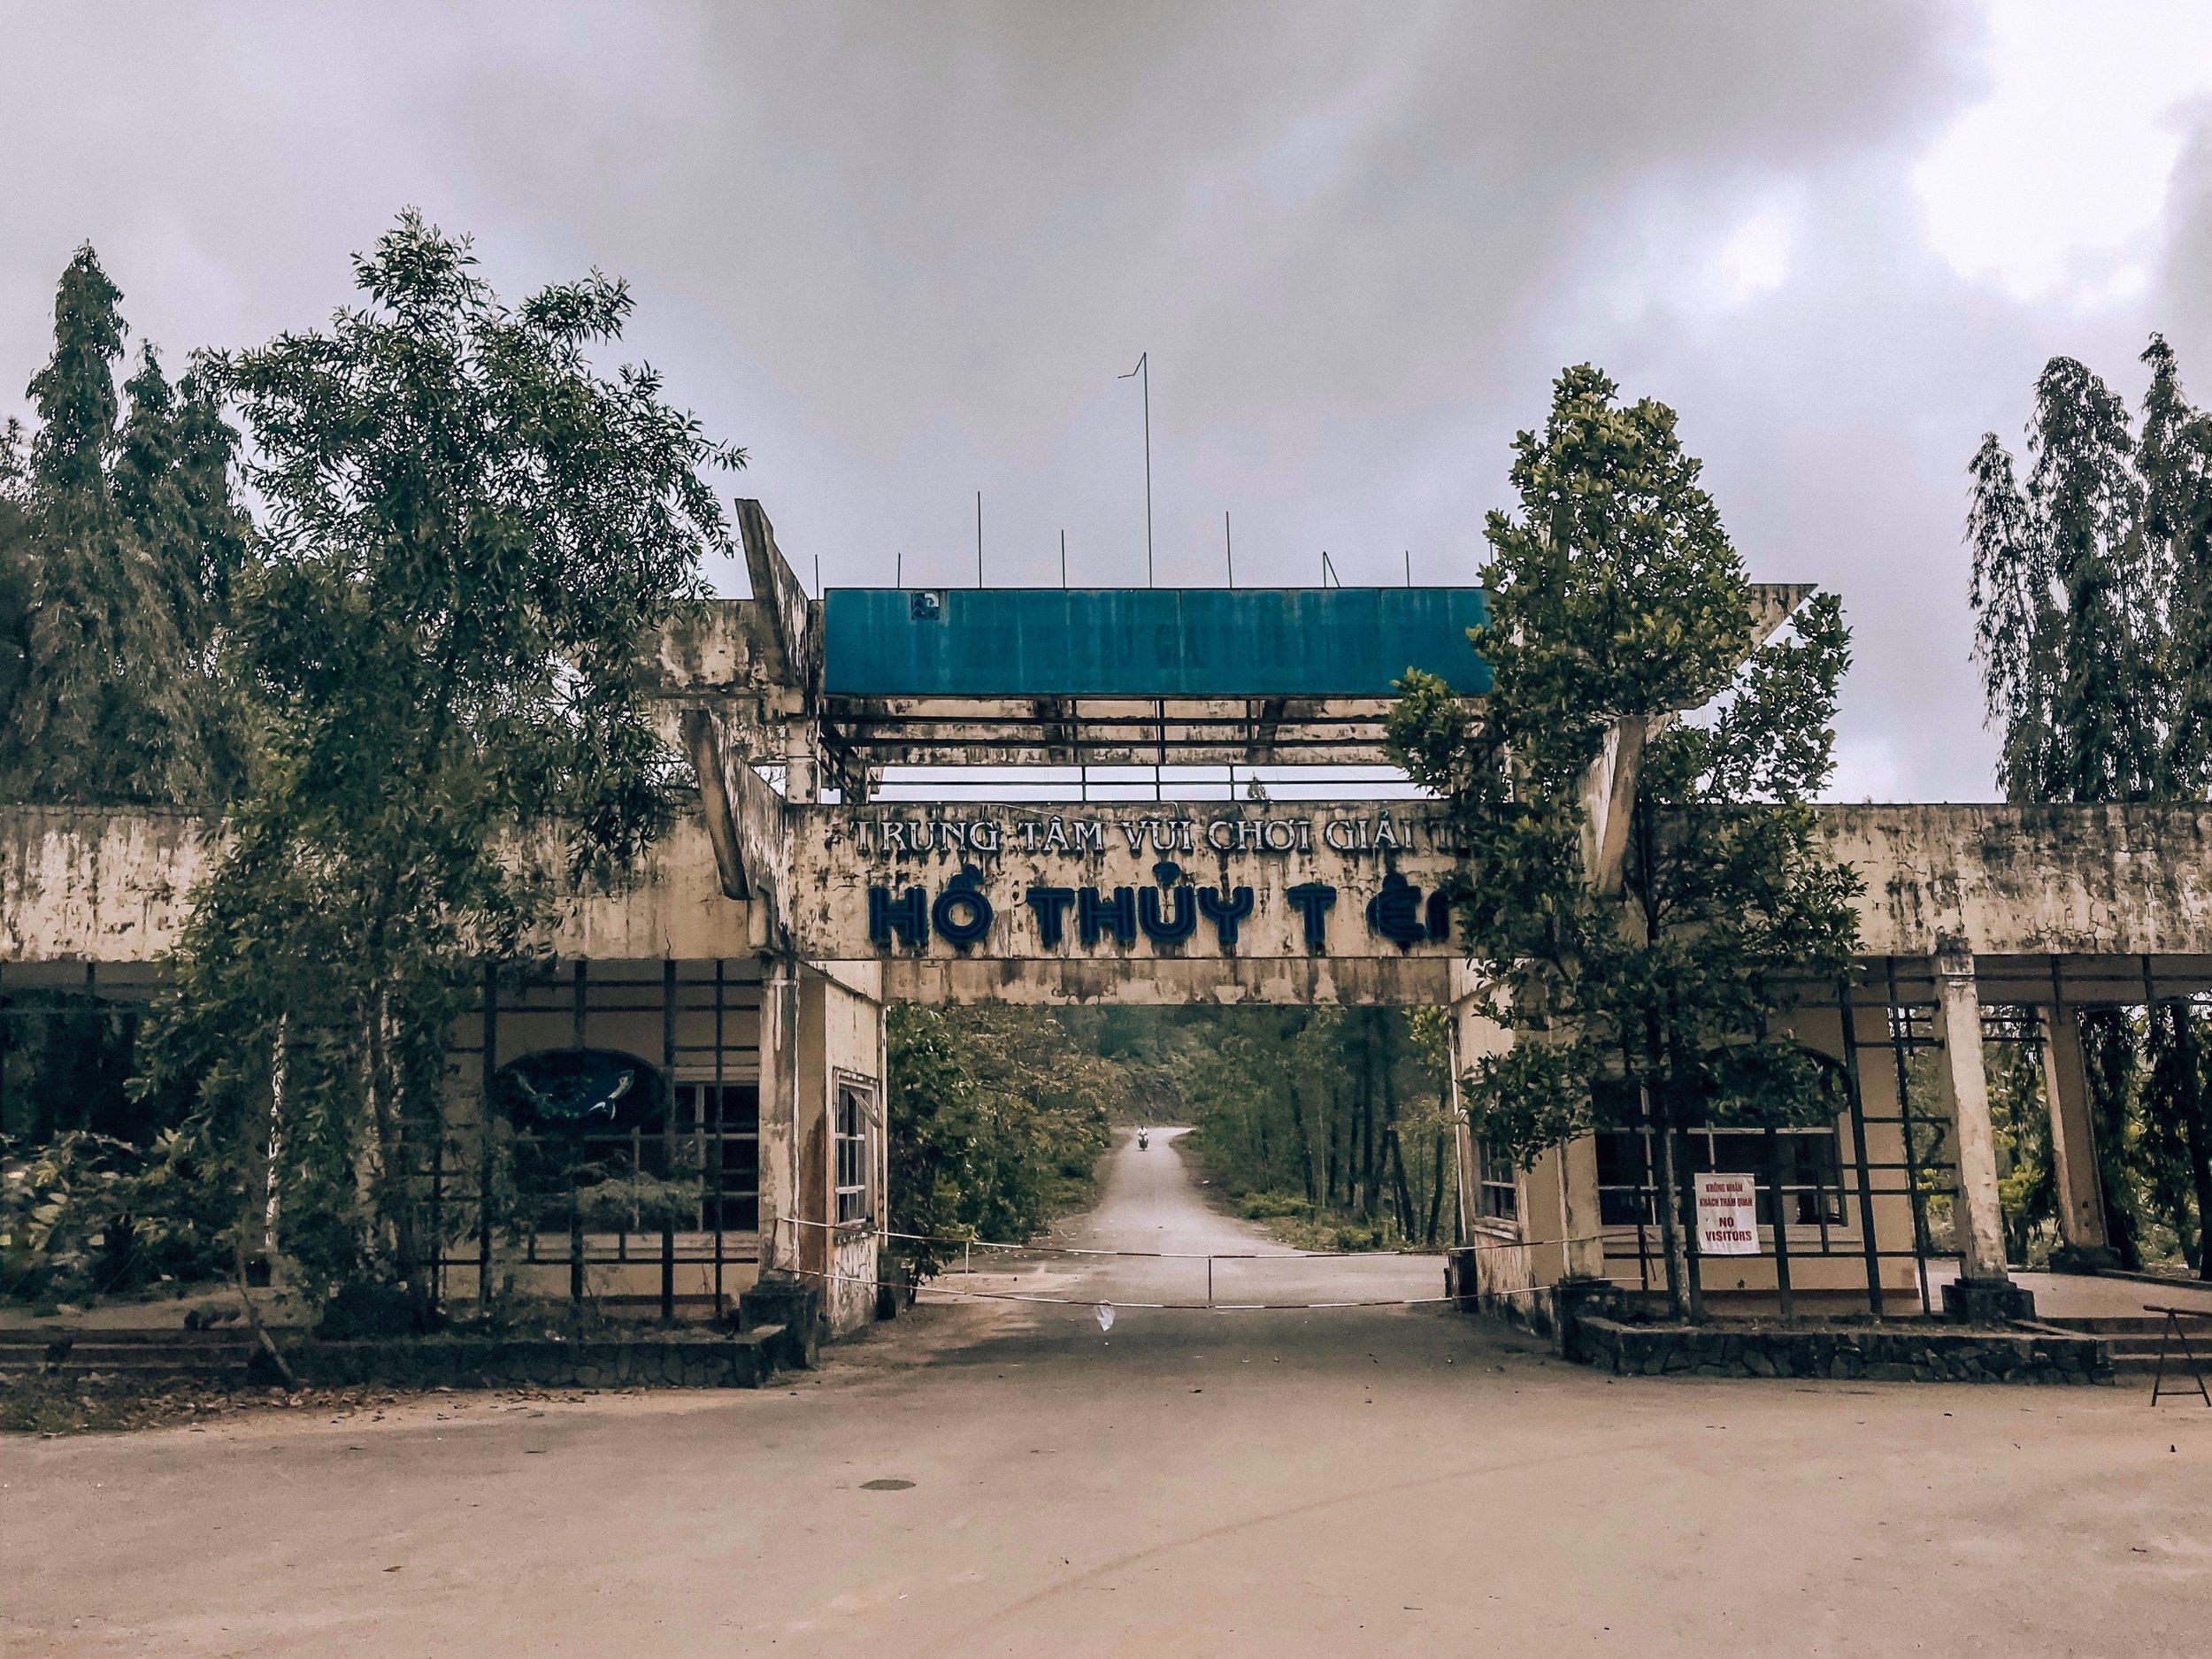 Main gates at front entrance of Ho Thuy Tien (abandoned waterpark) in Hue, Vietnam